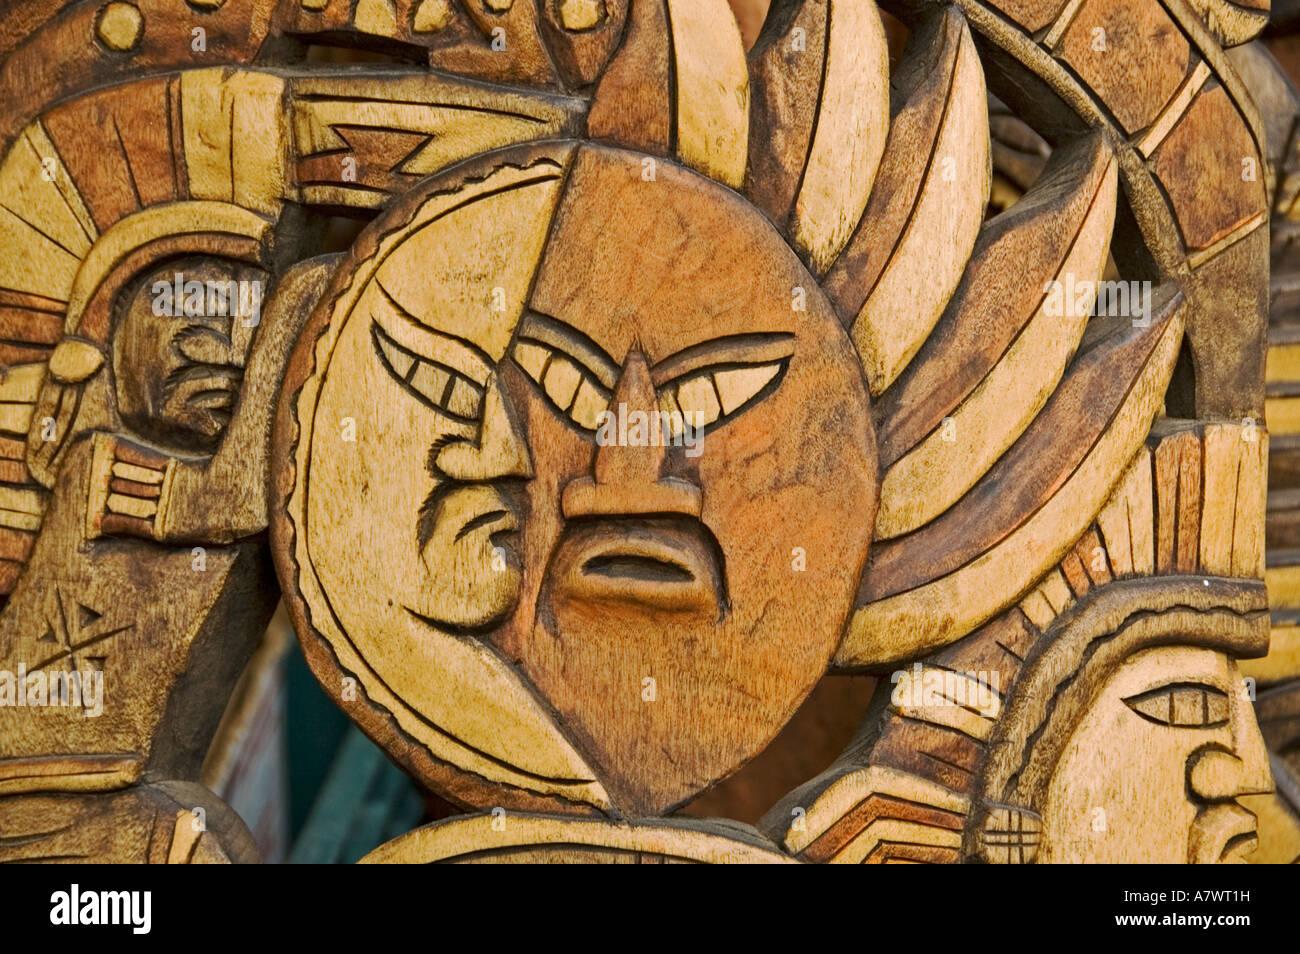 Art and crafts carve art masks Yucatan Mexico - Stock Image